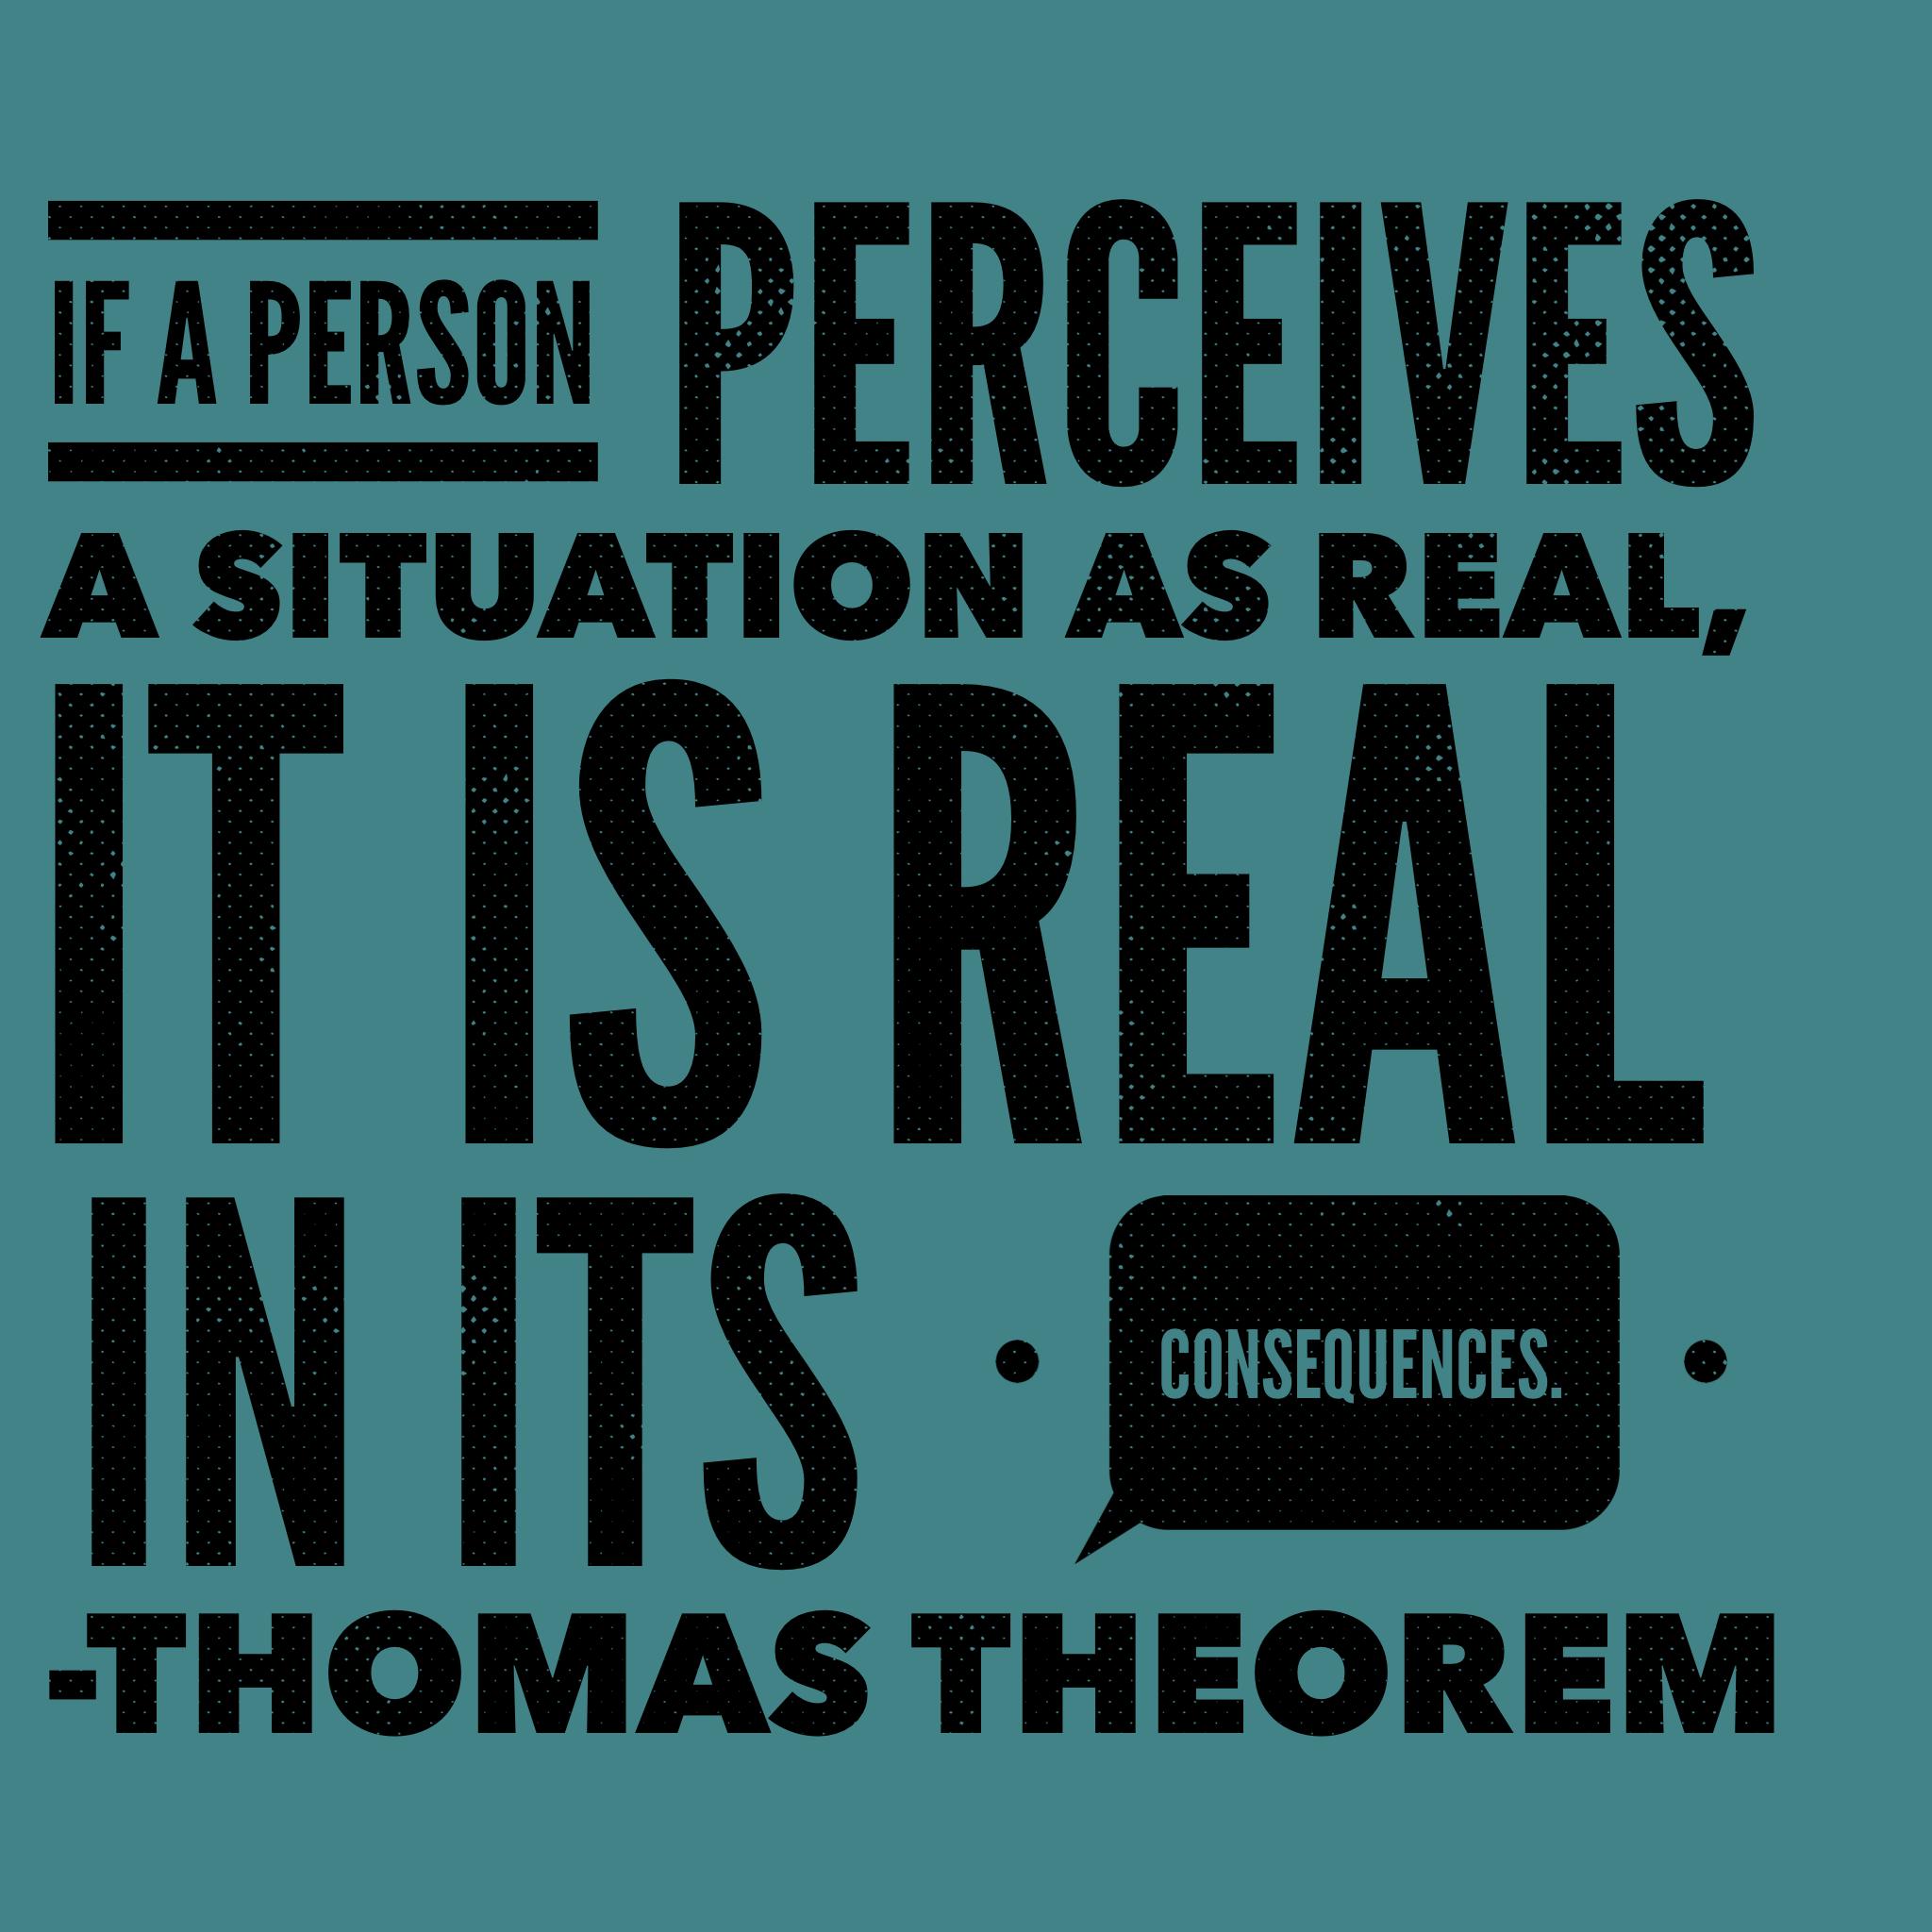 The Thomas theorem. Perception becomes reality. | Interesting ...